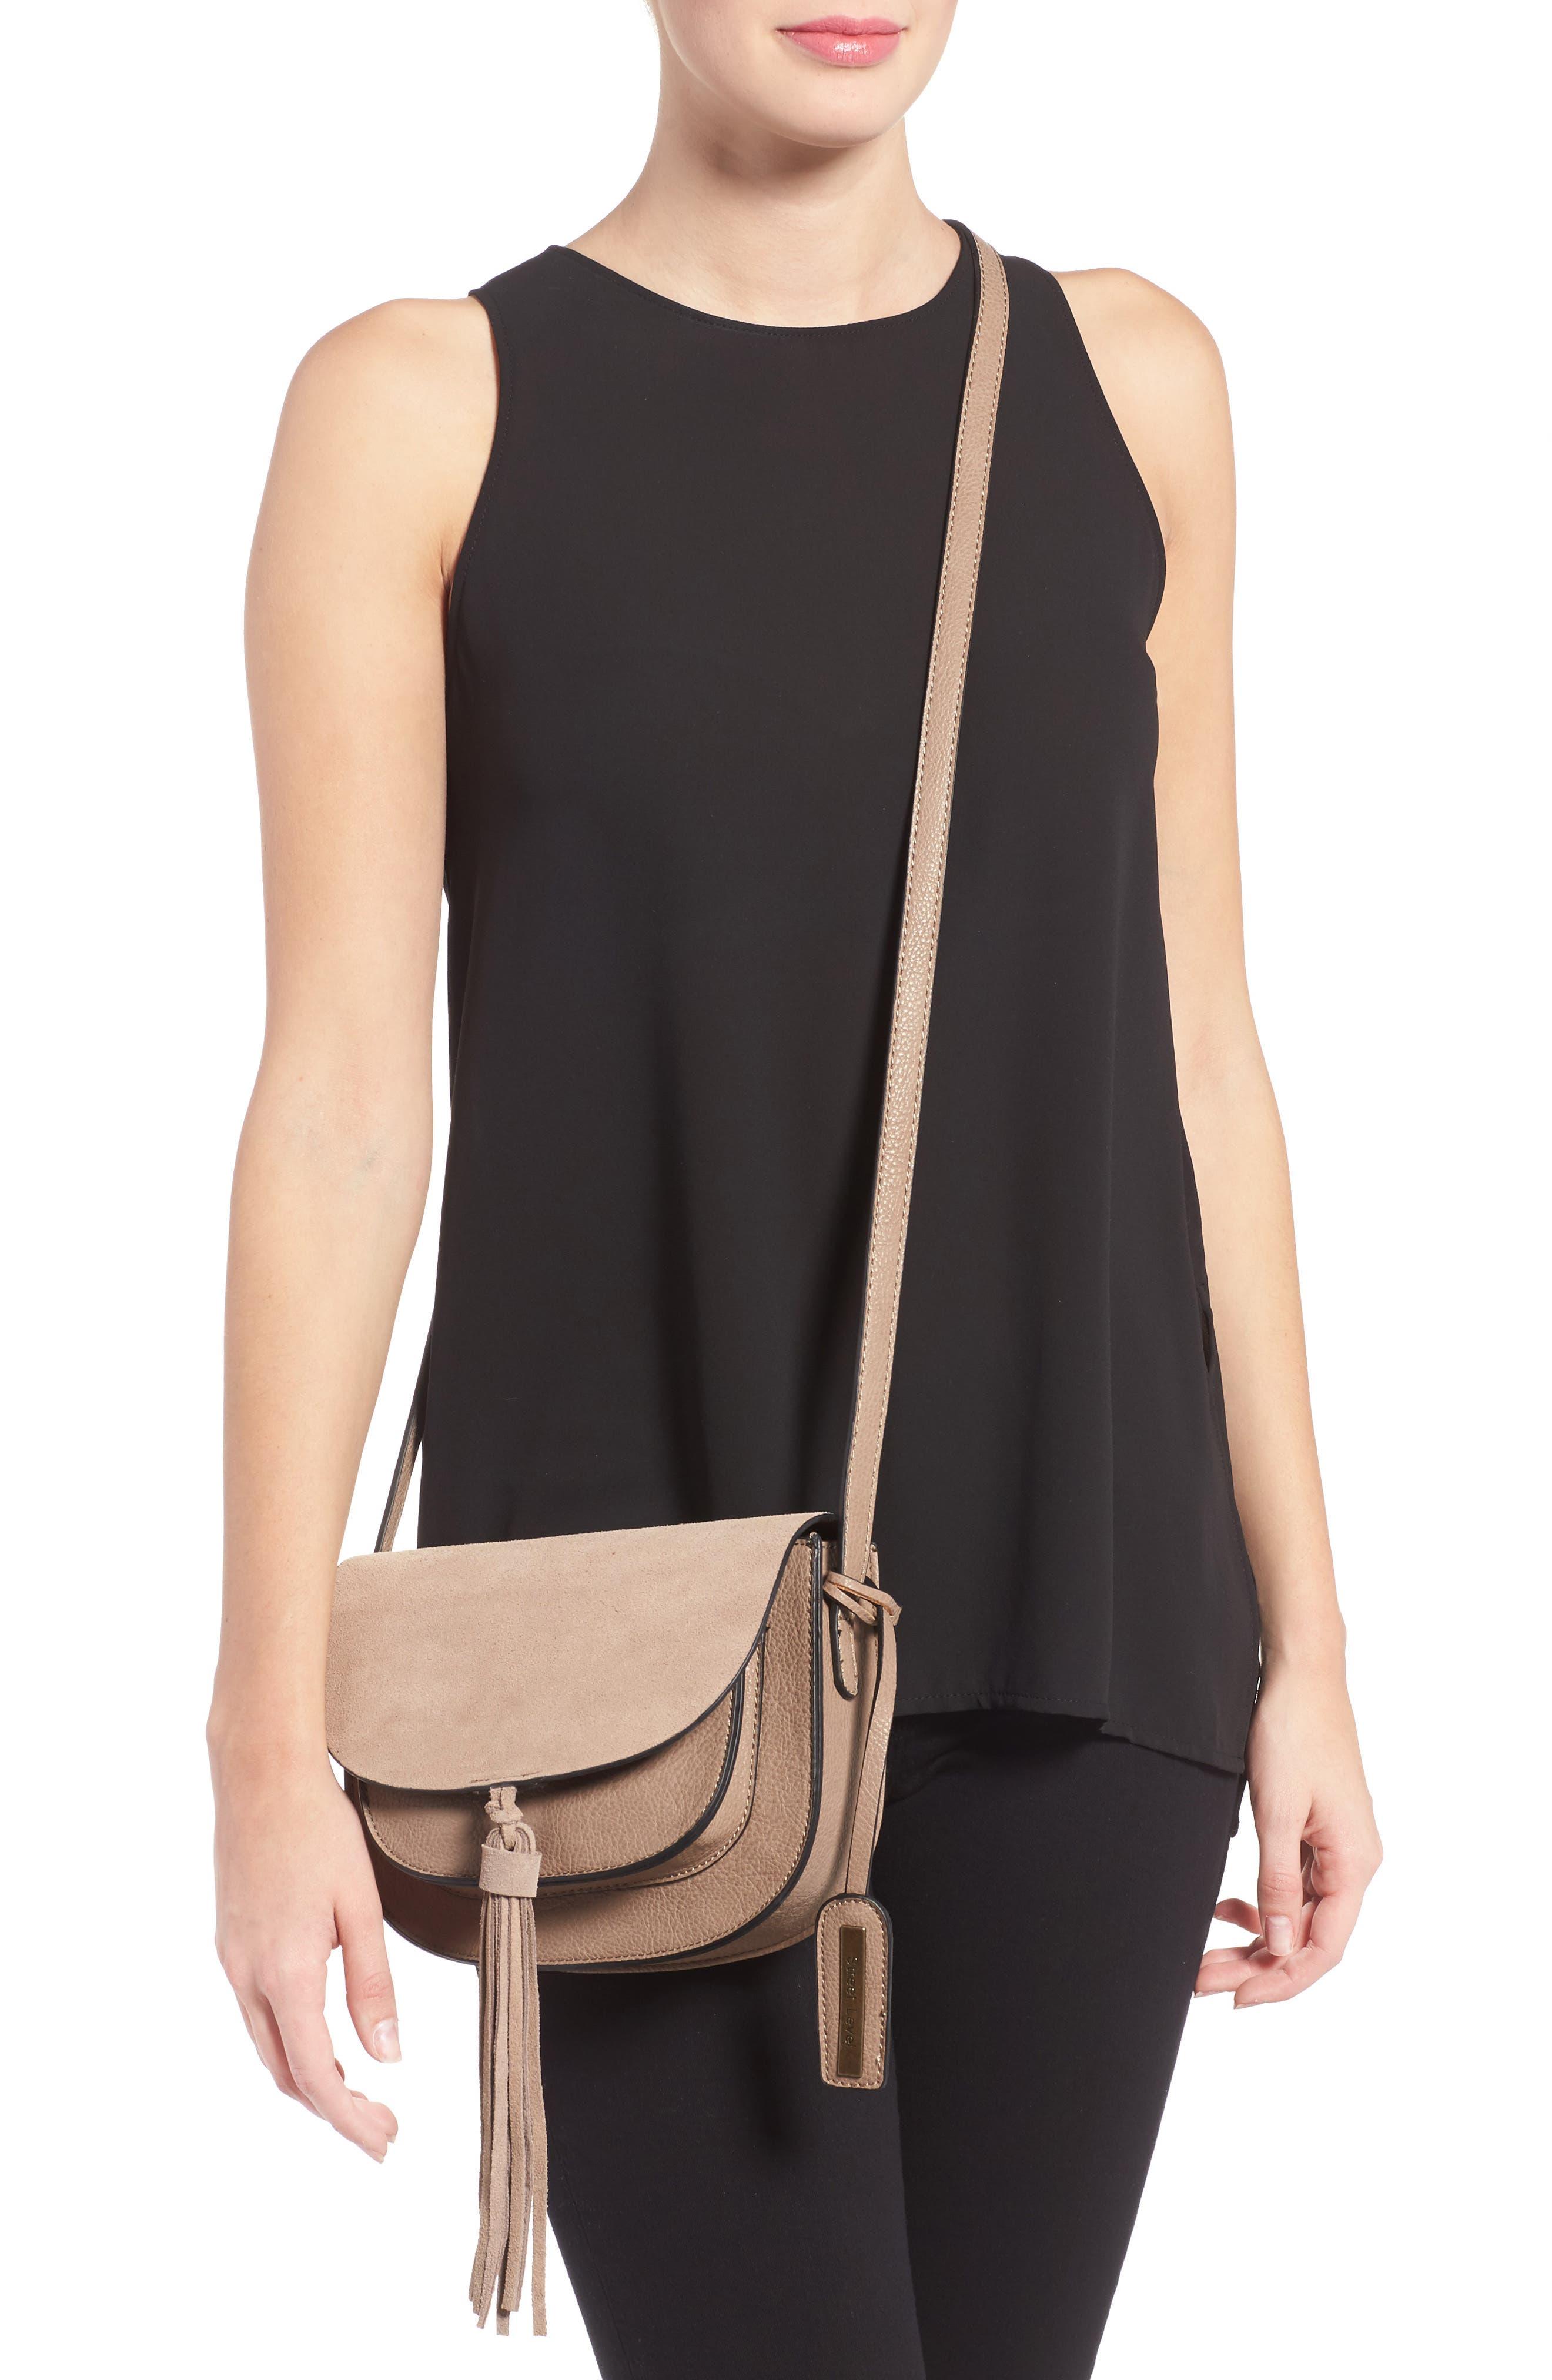 Tassel Faux Leather Crossbody Bag,                             Alternate thumbnail 3, color,                             250